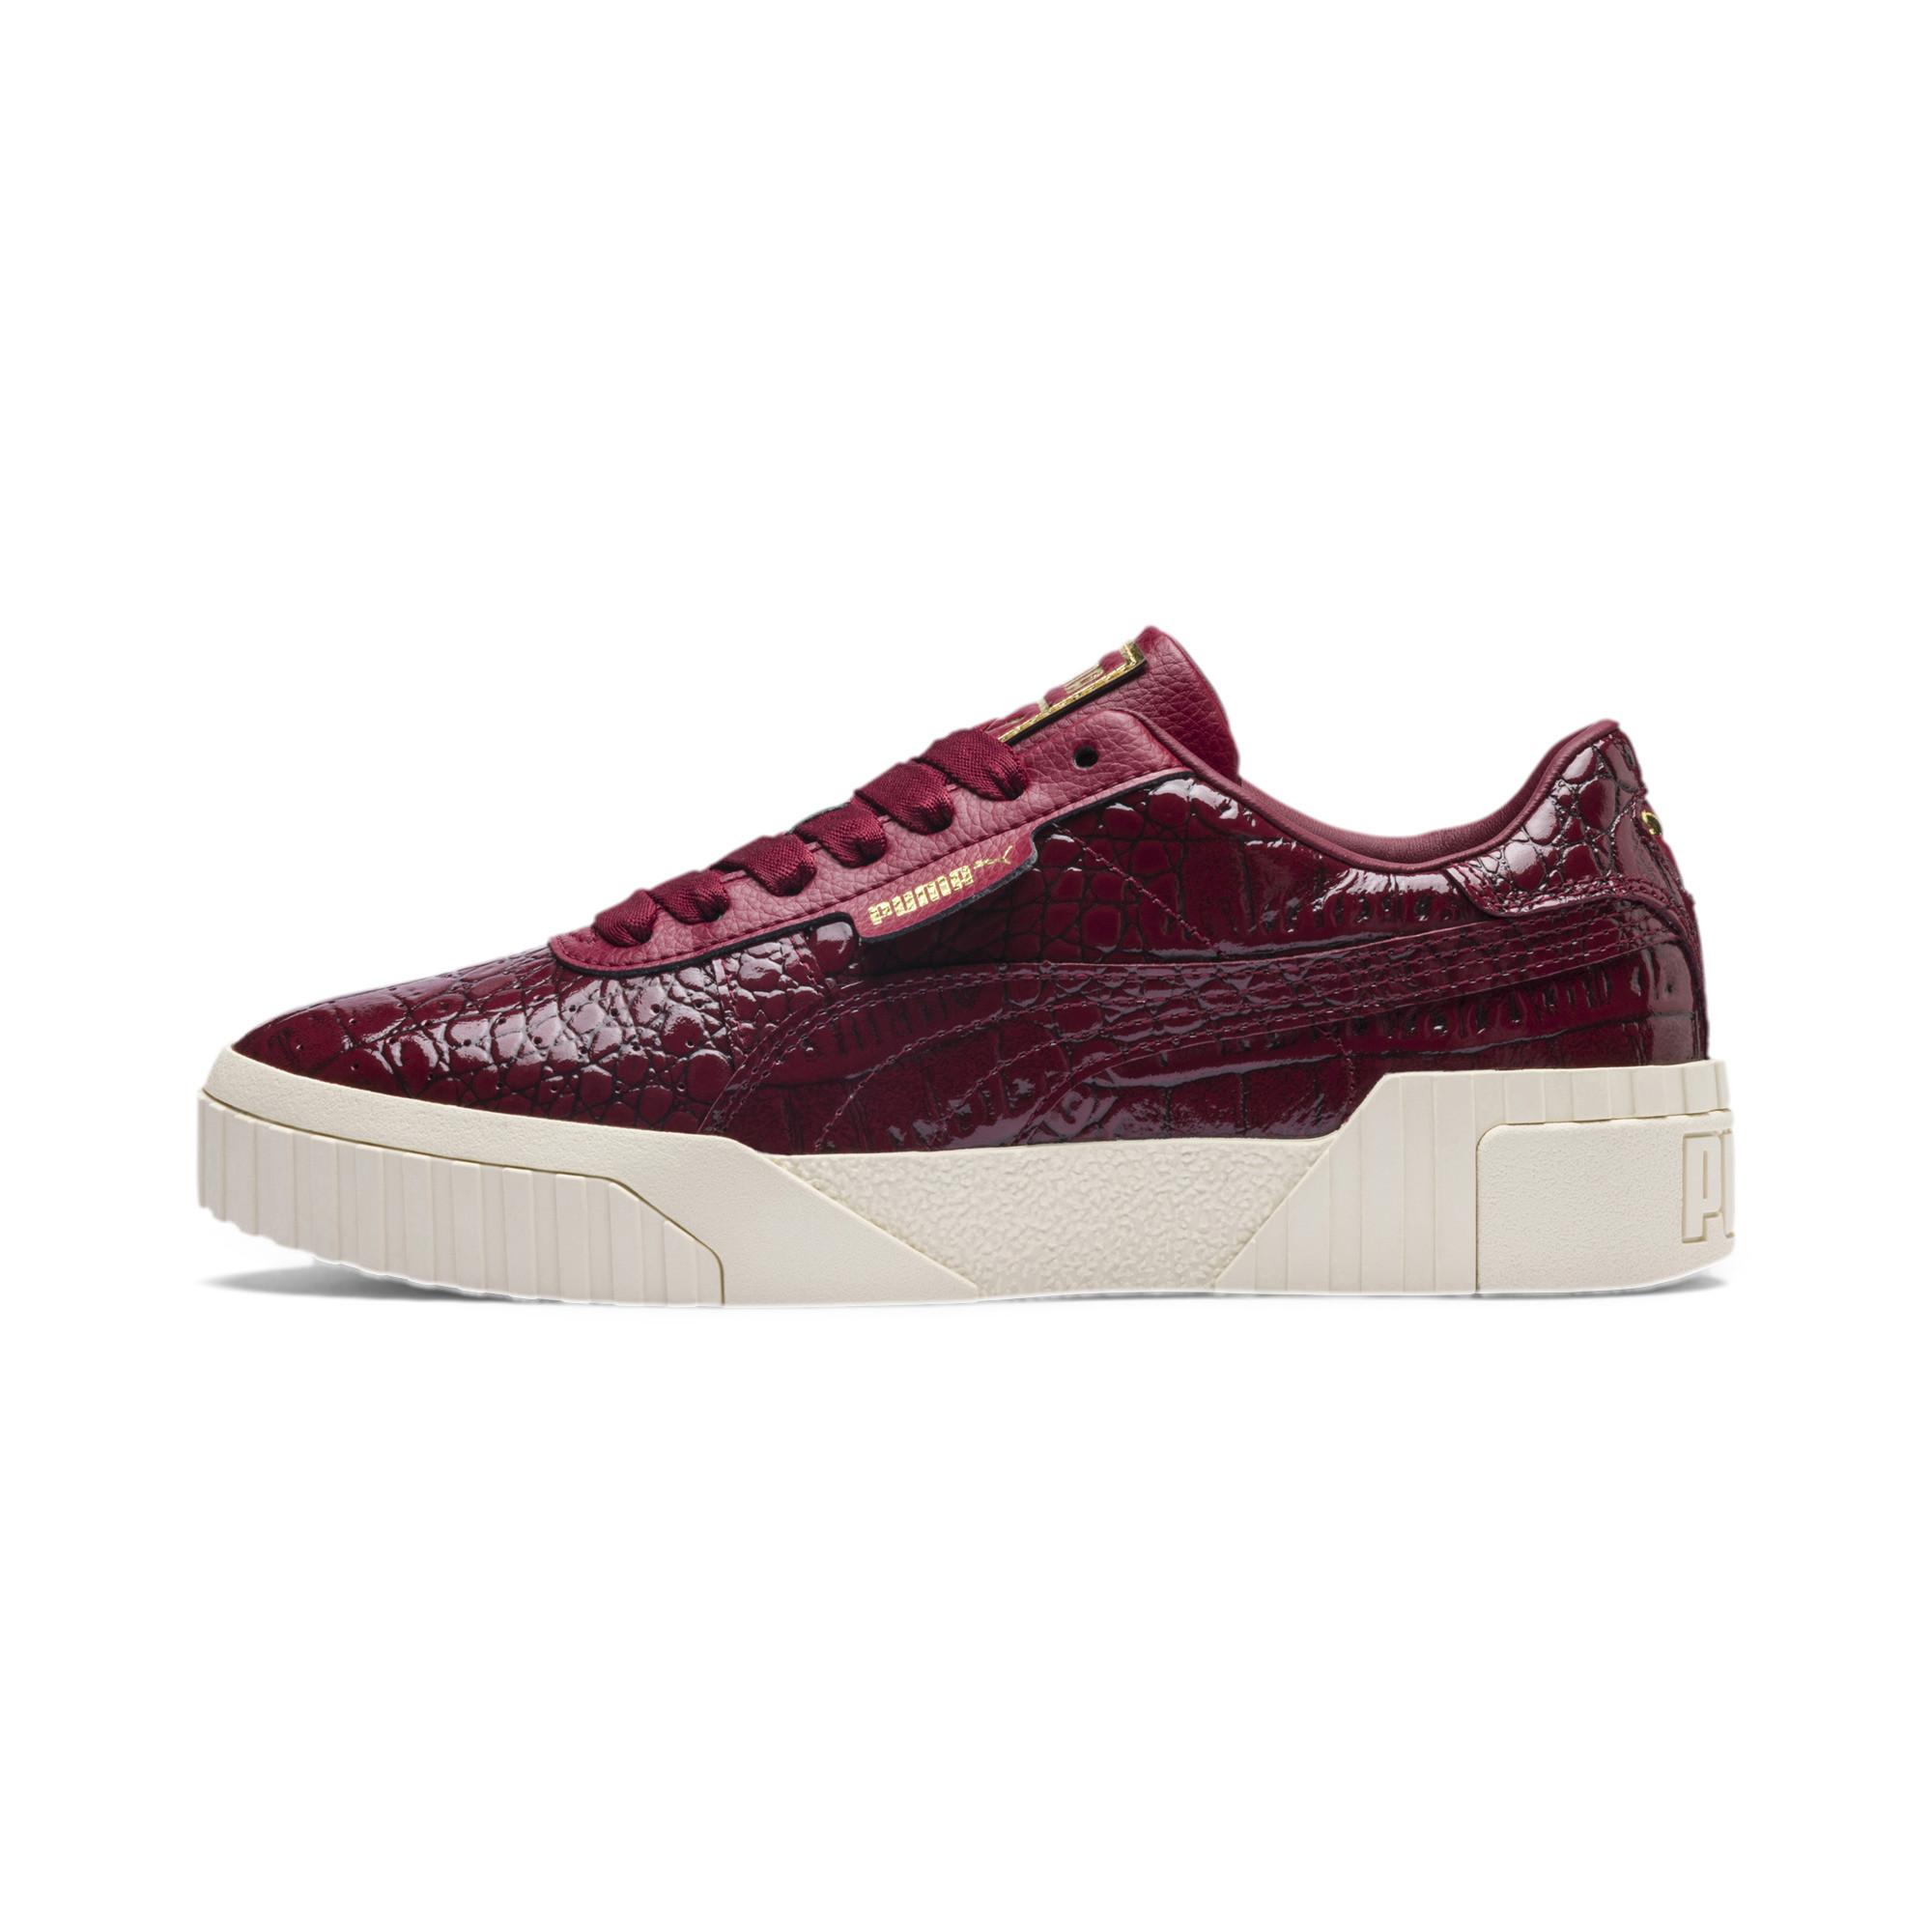 Image Puma Cali Croc Women's Sneakers #1